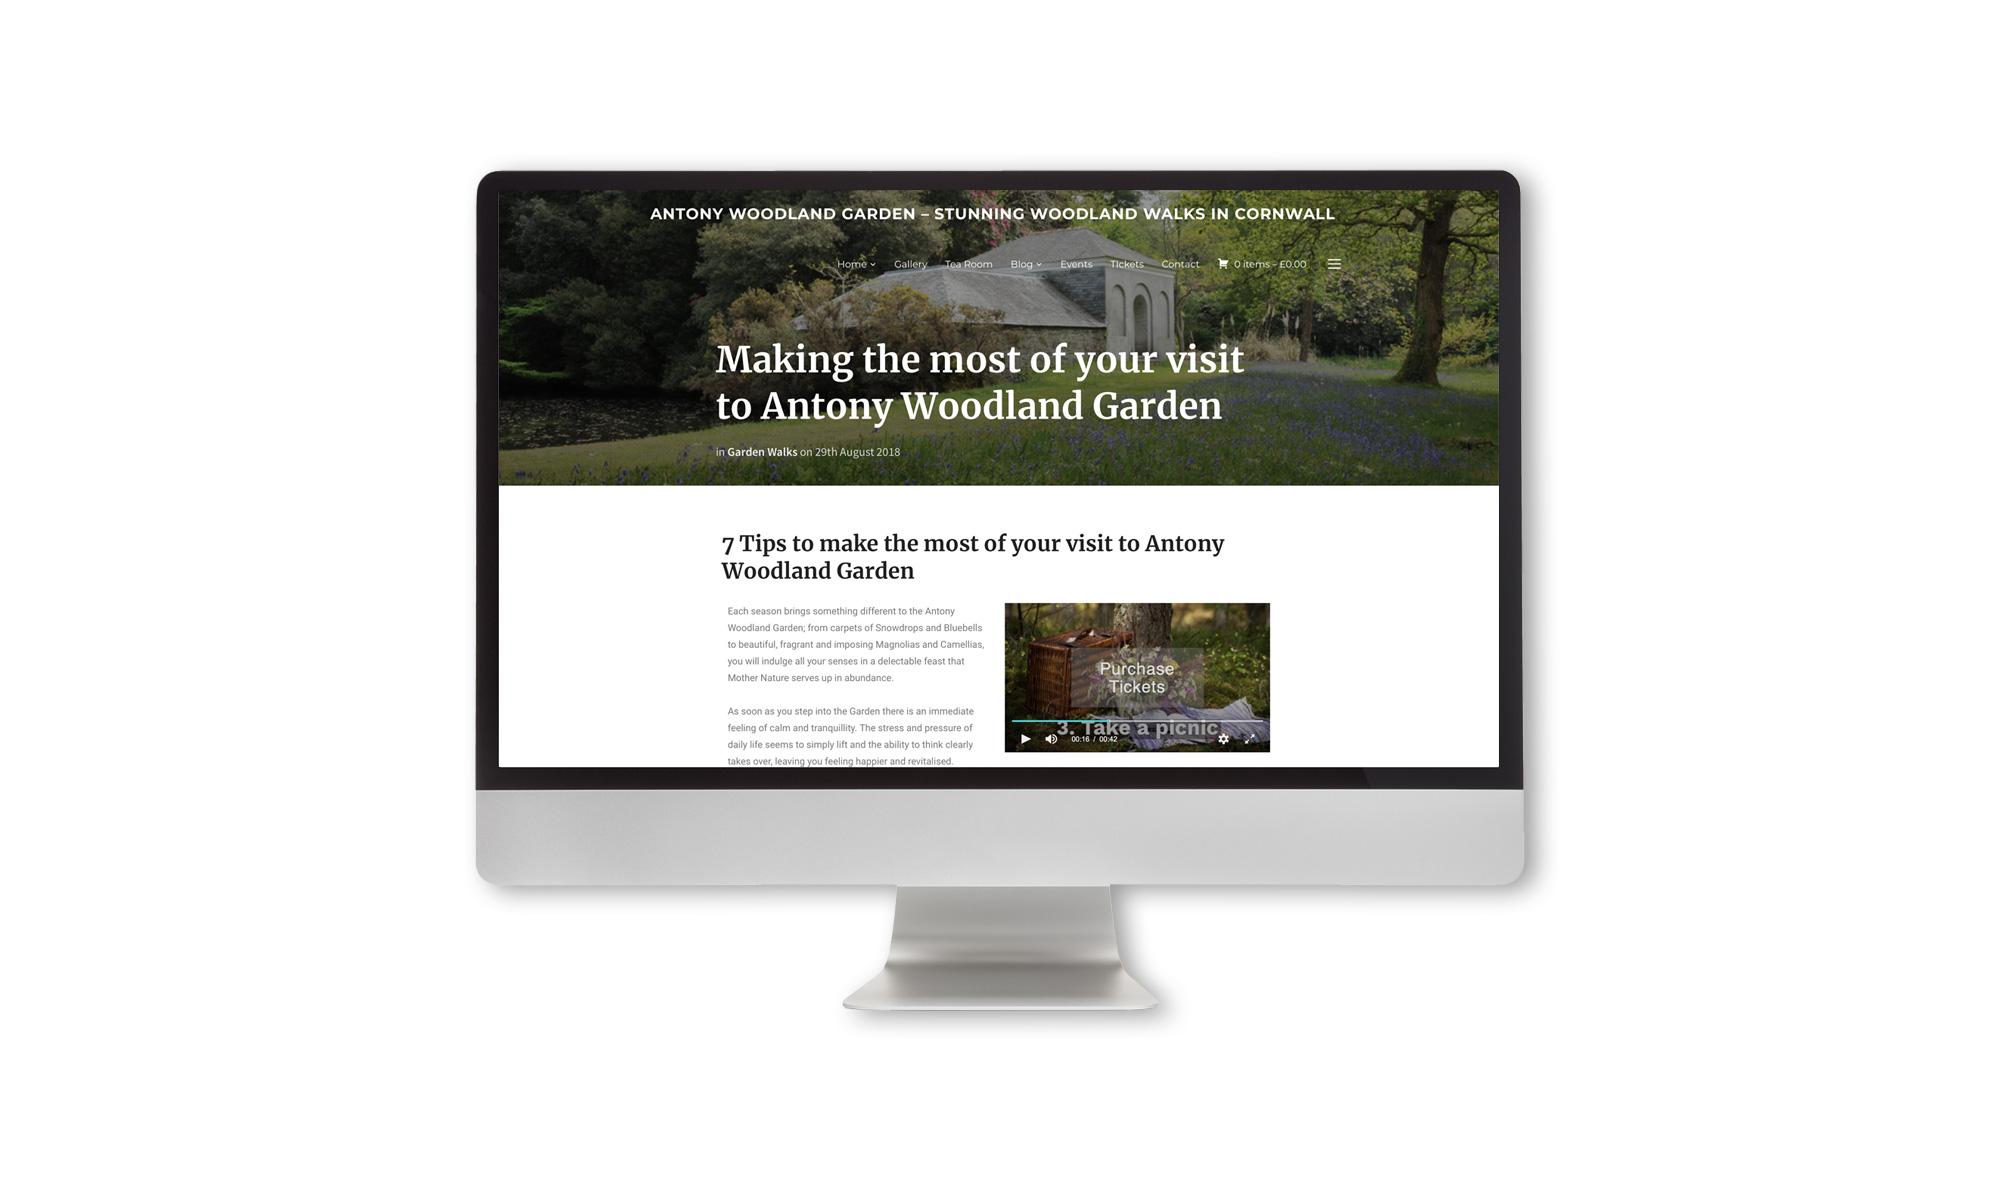 Antony Woodland garden Blog content